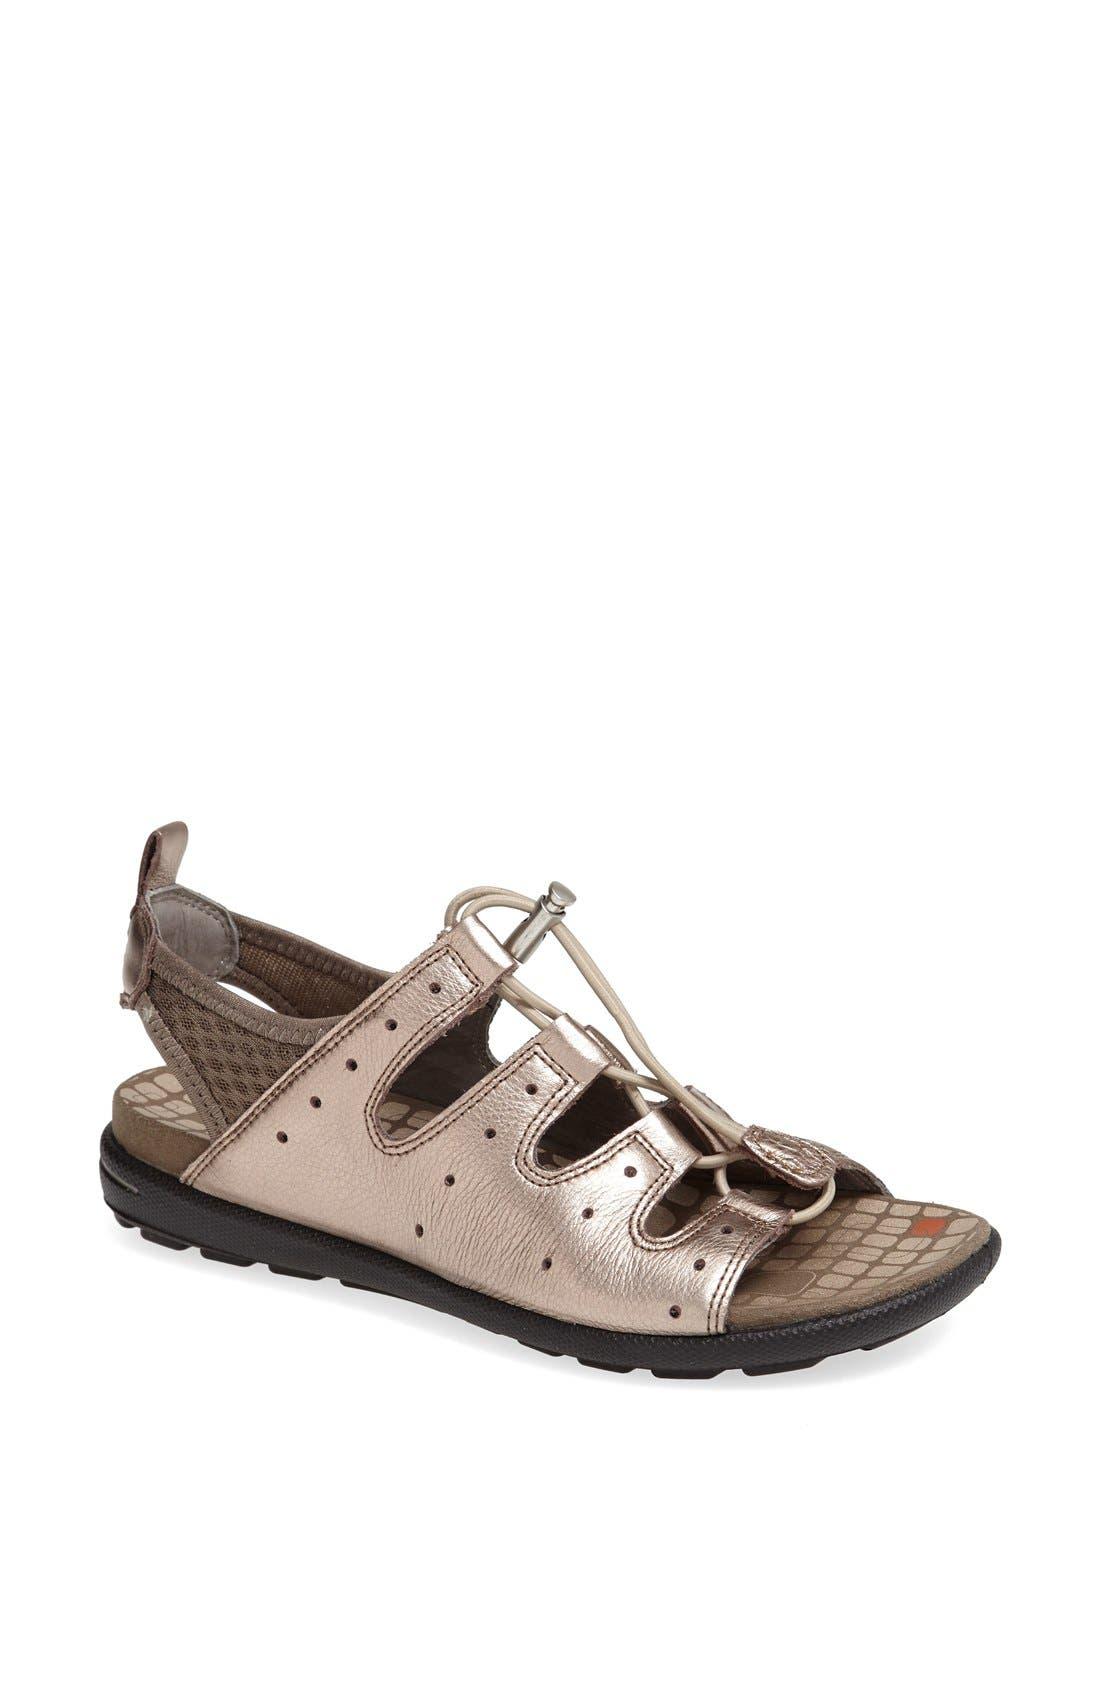 ECCO 'Jab' Sandal